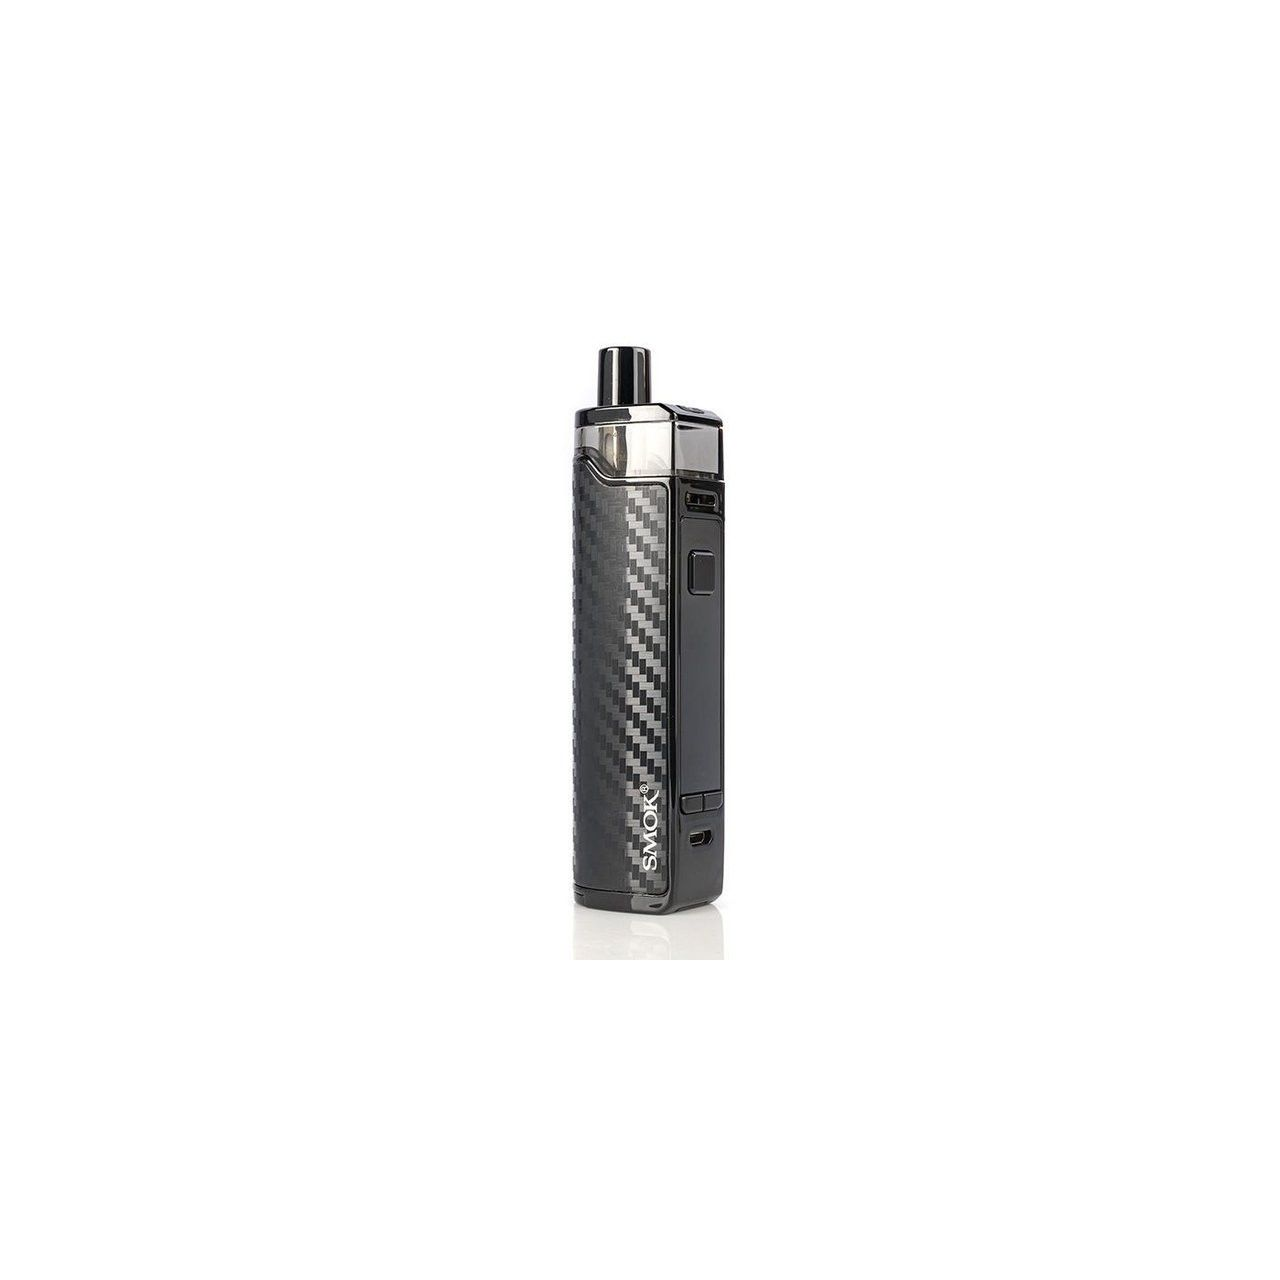 Mod Pod Smok RPM80 3000mAh (Bateria...